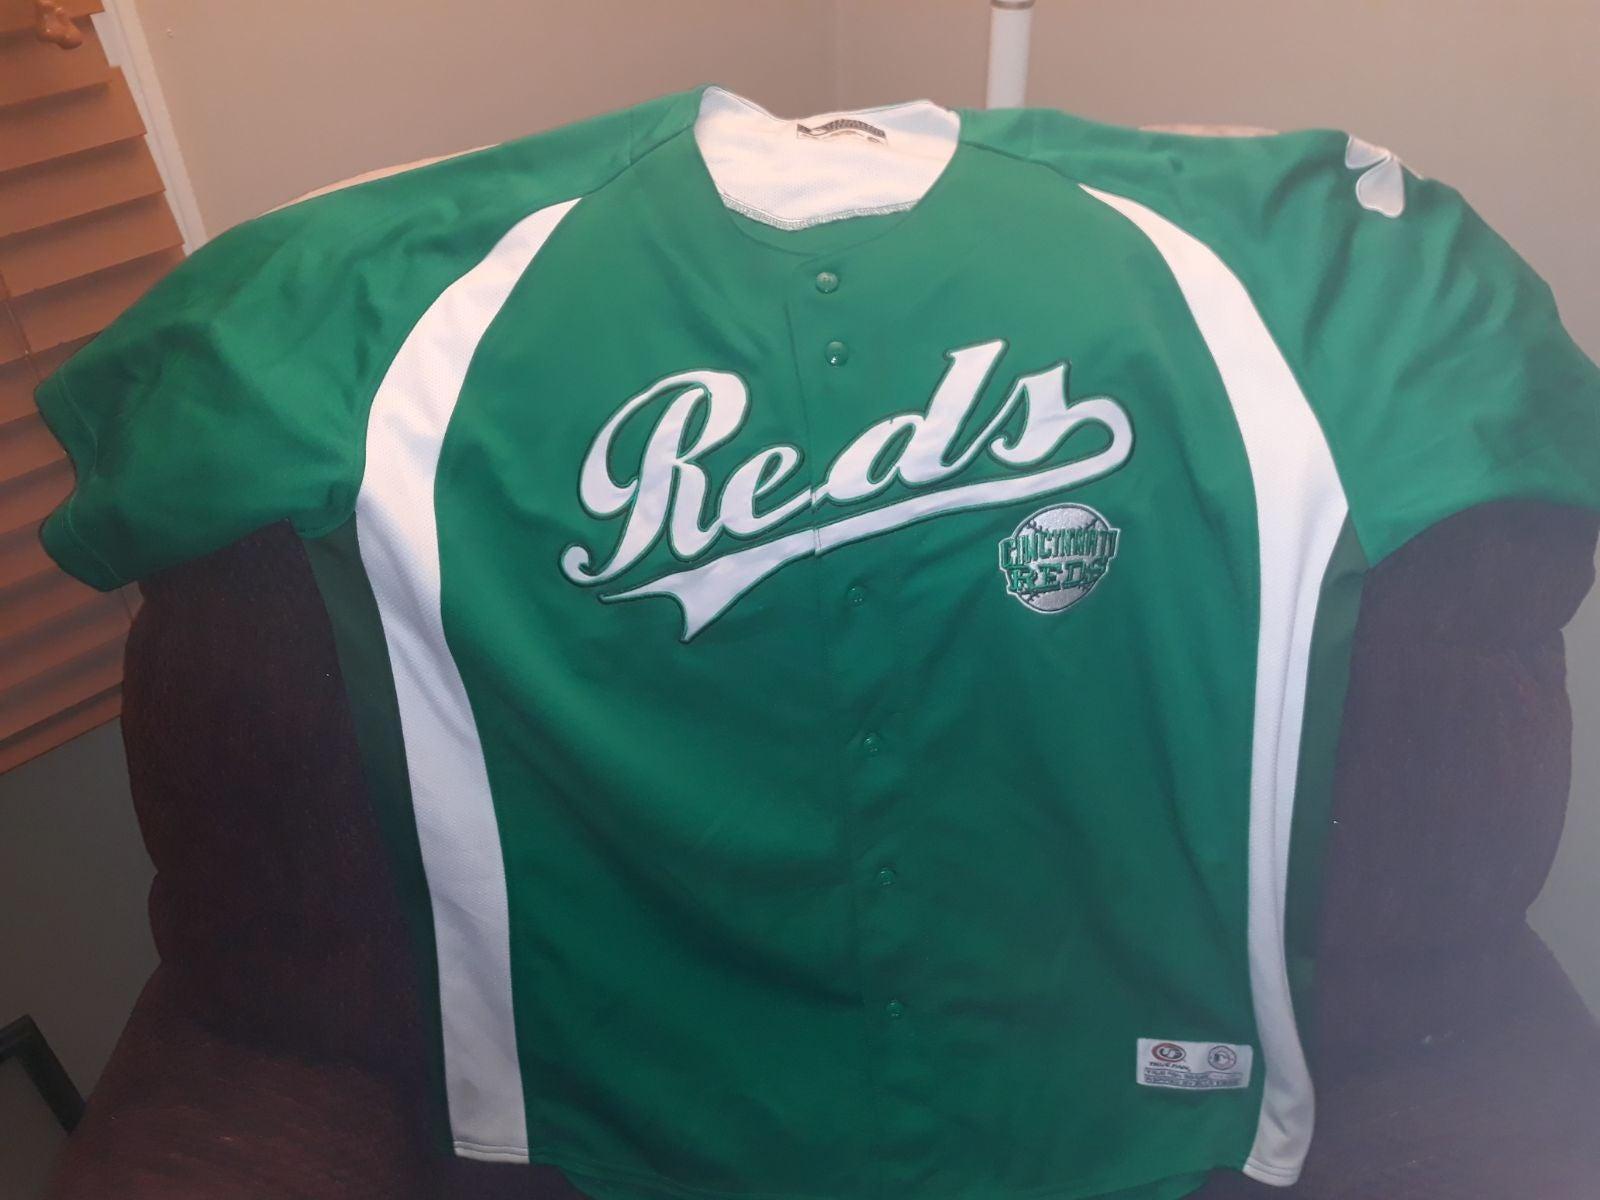 Cincinnati Reds (Green) shamrock Jersey